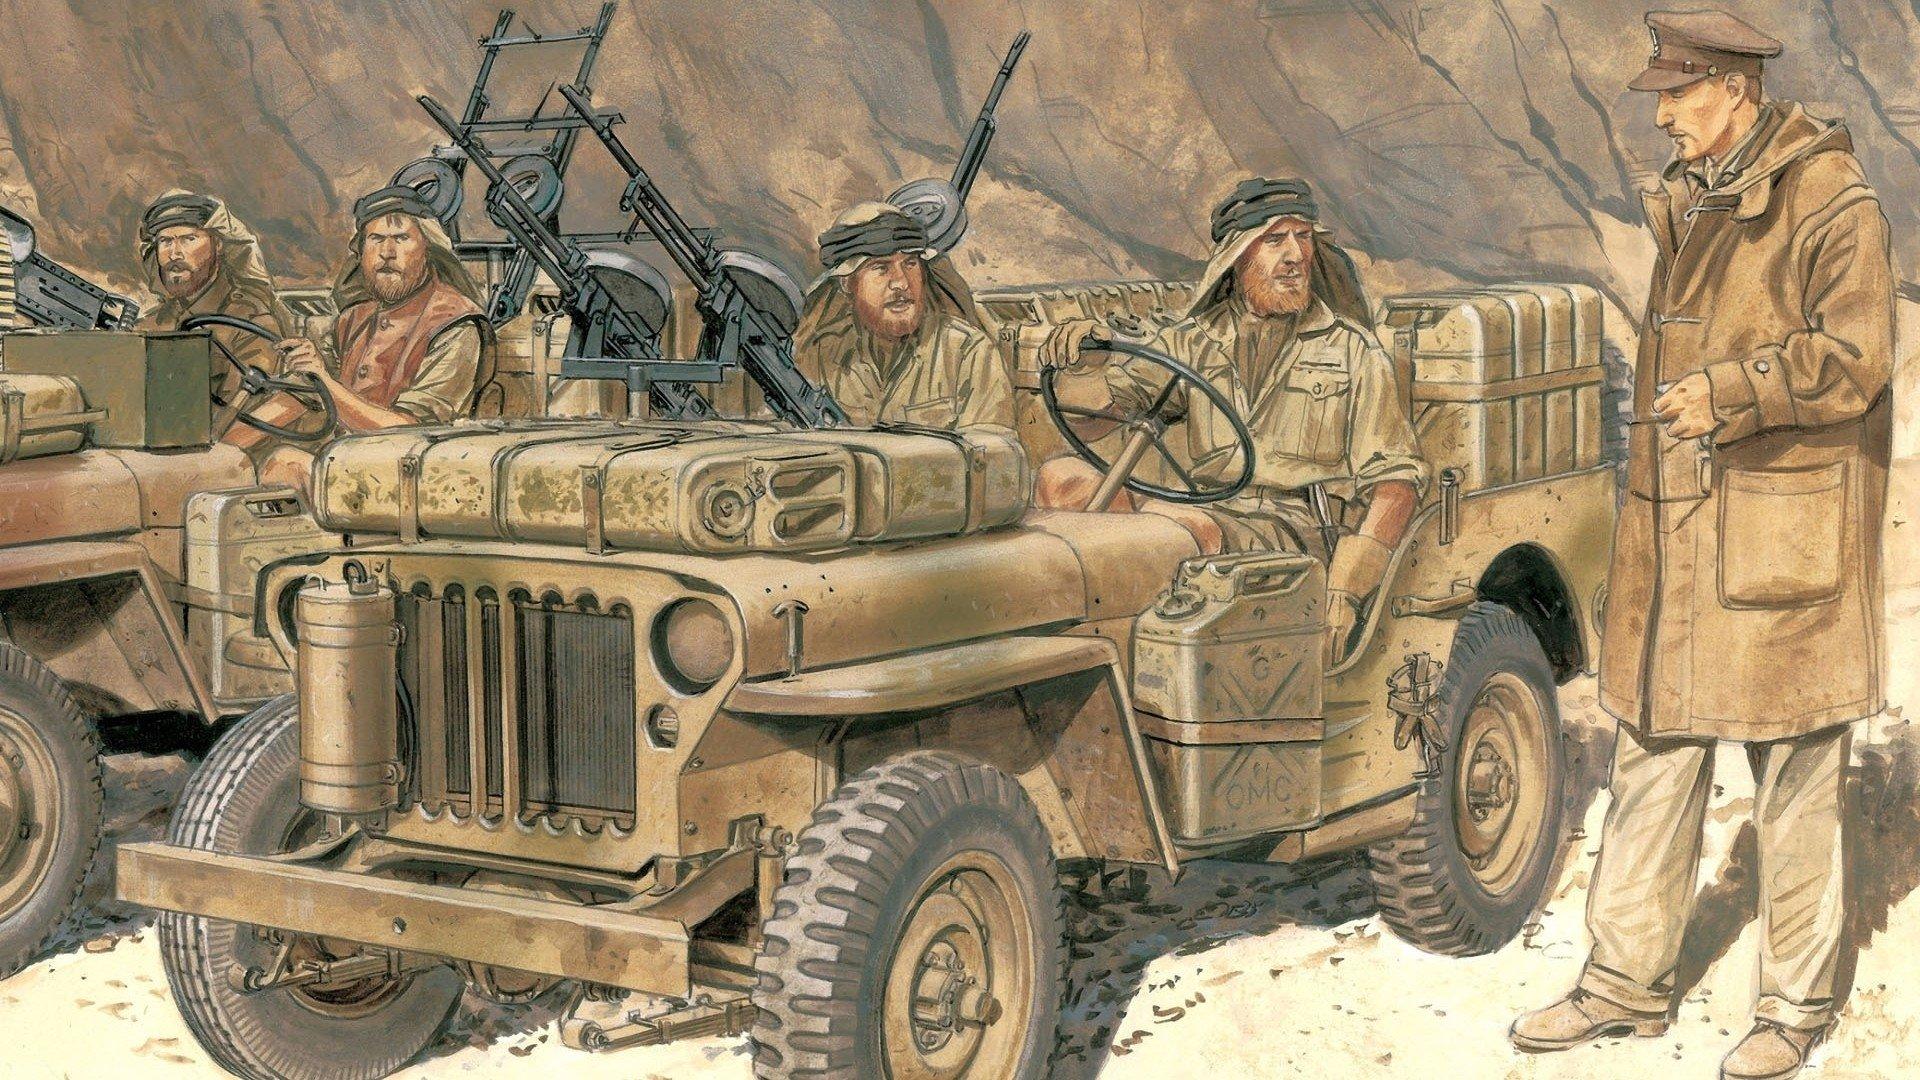 Lieutenant David Sterling British Sas Troops Hd Wallpaper Background Image 1920x1080